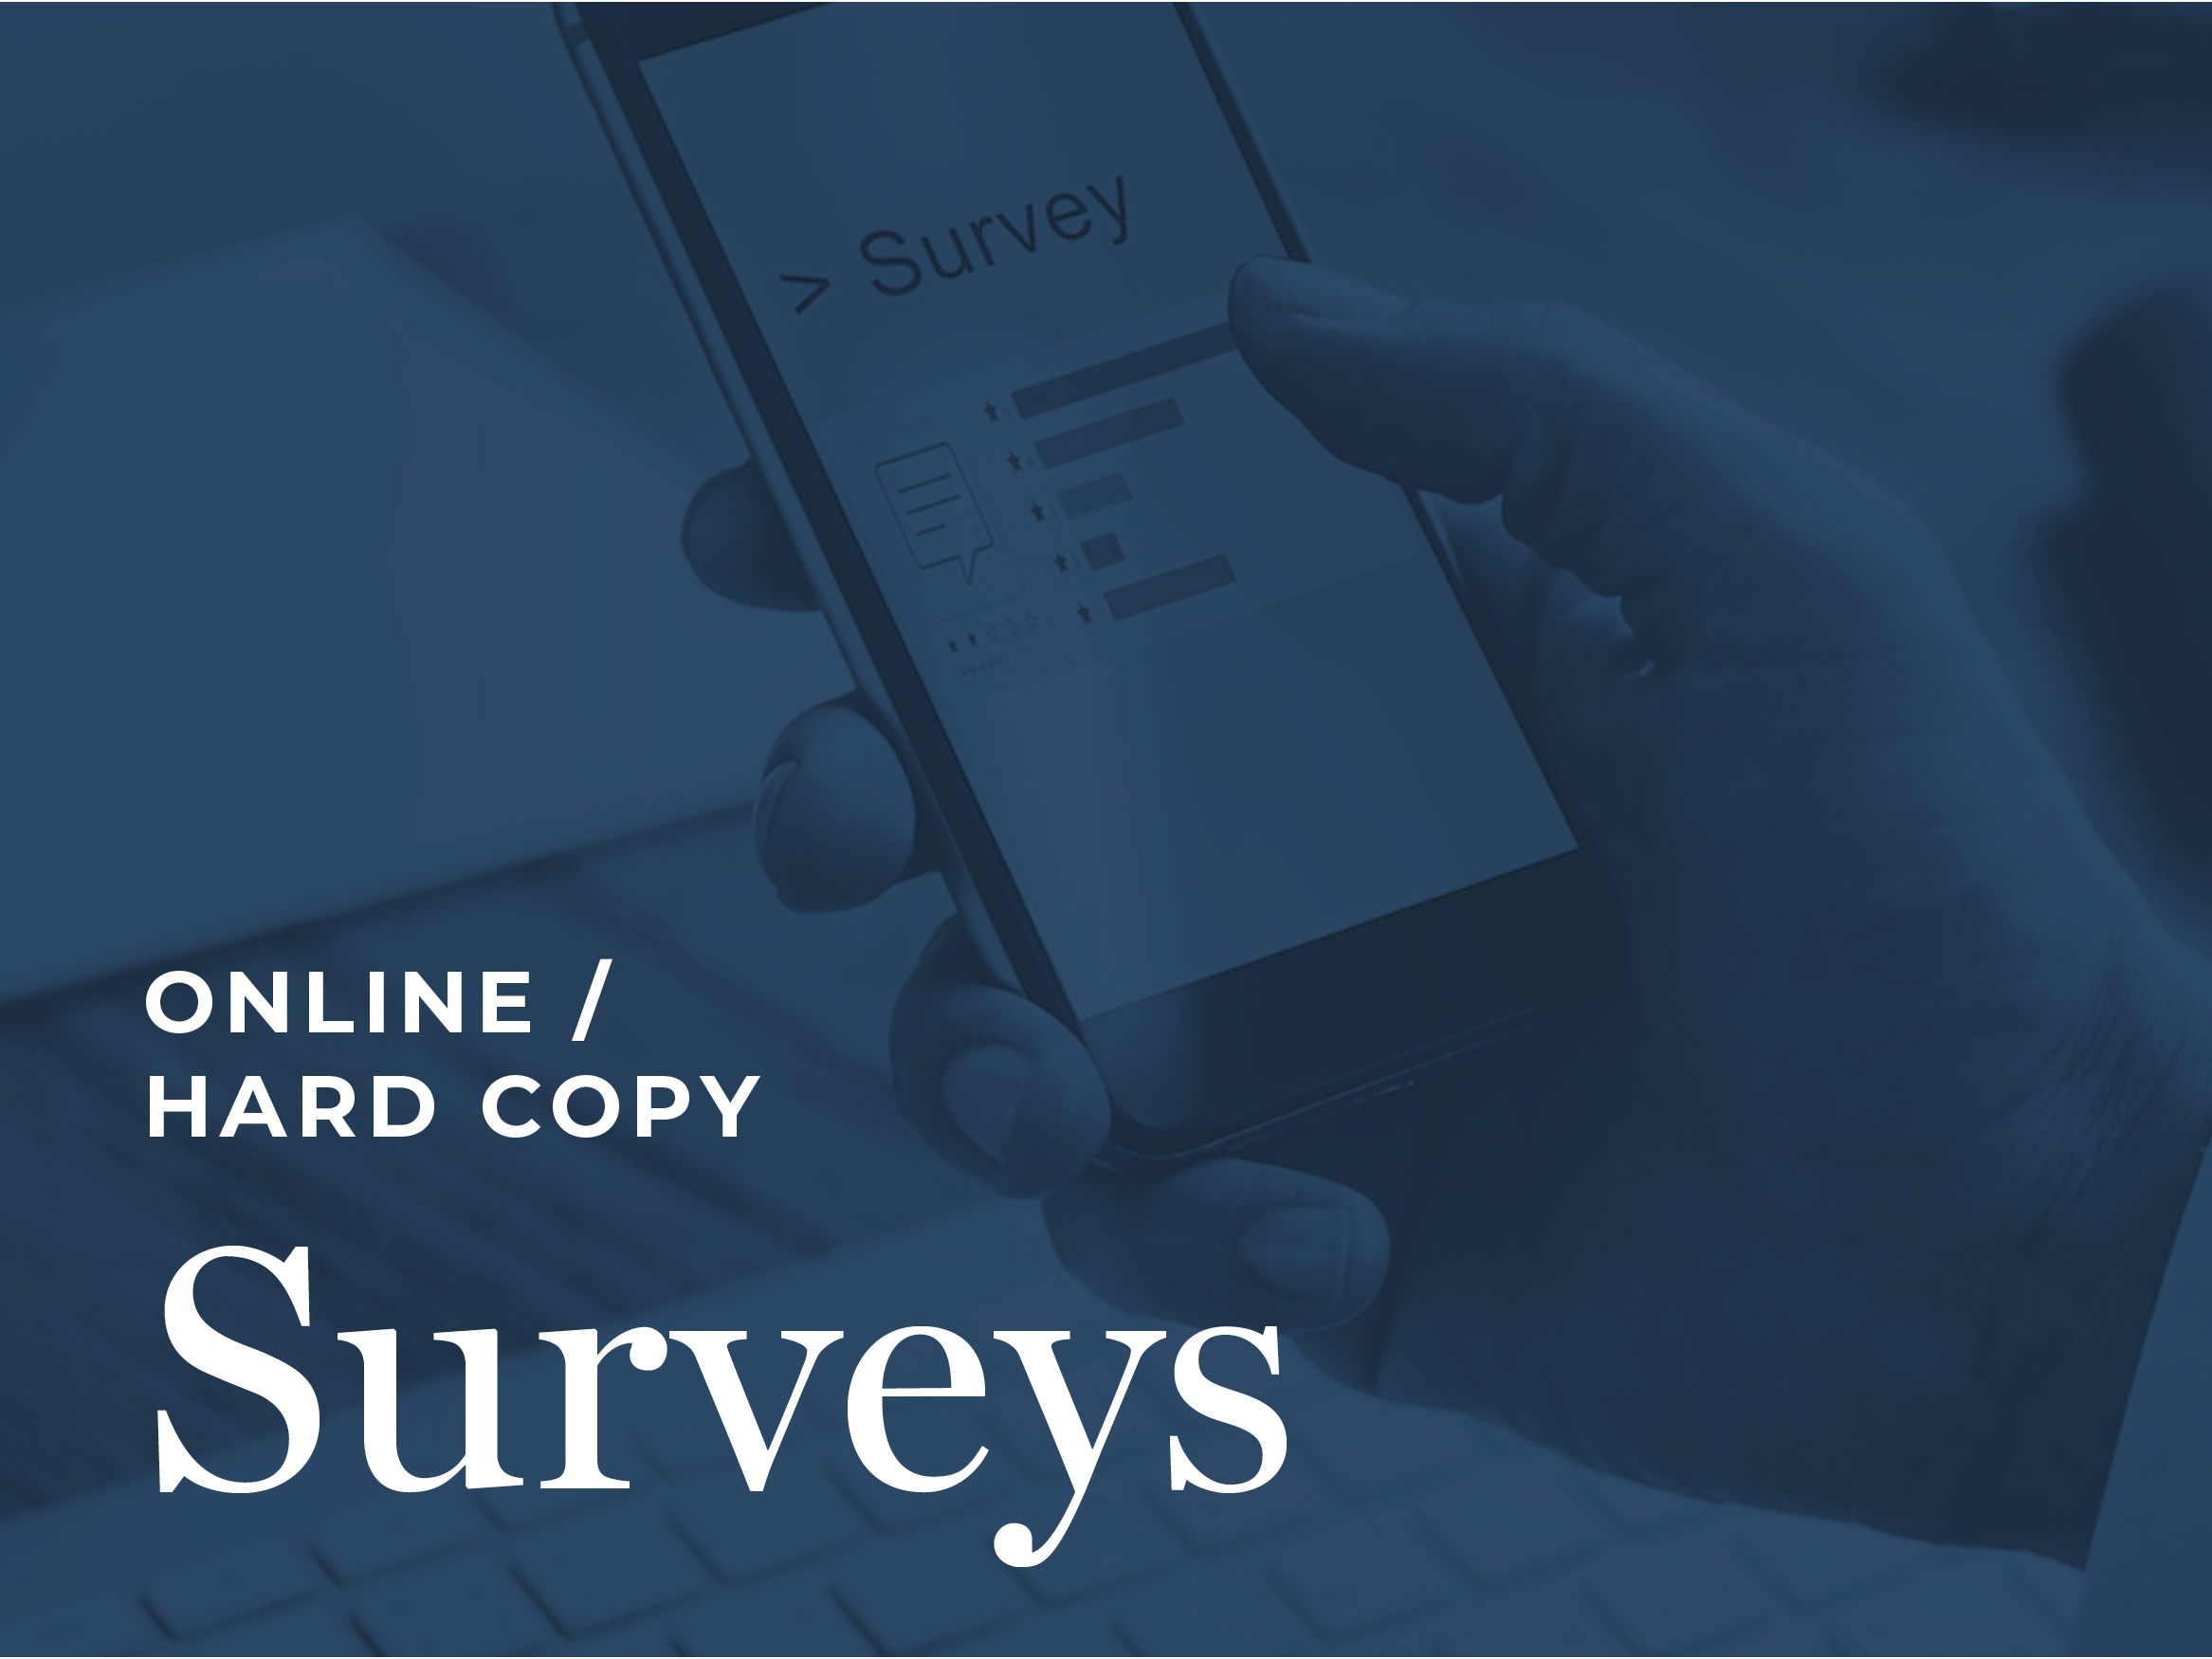 BUTTON-Surveys.jpg